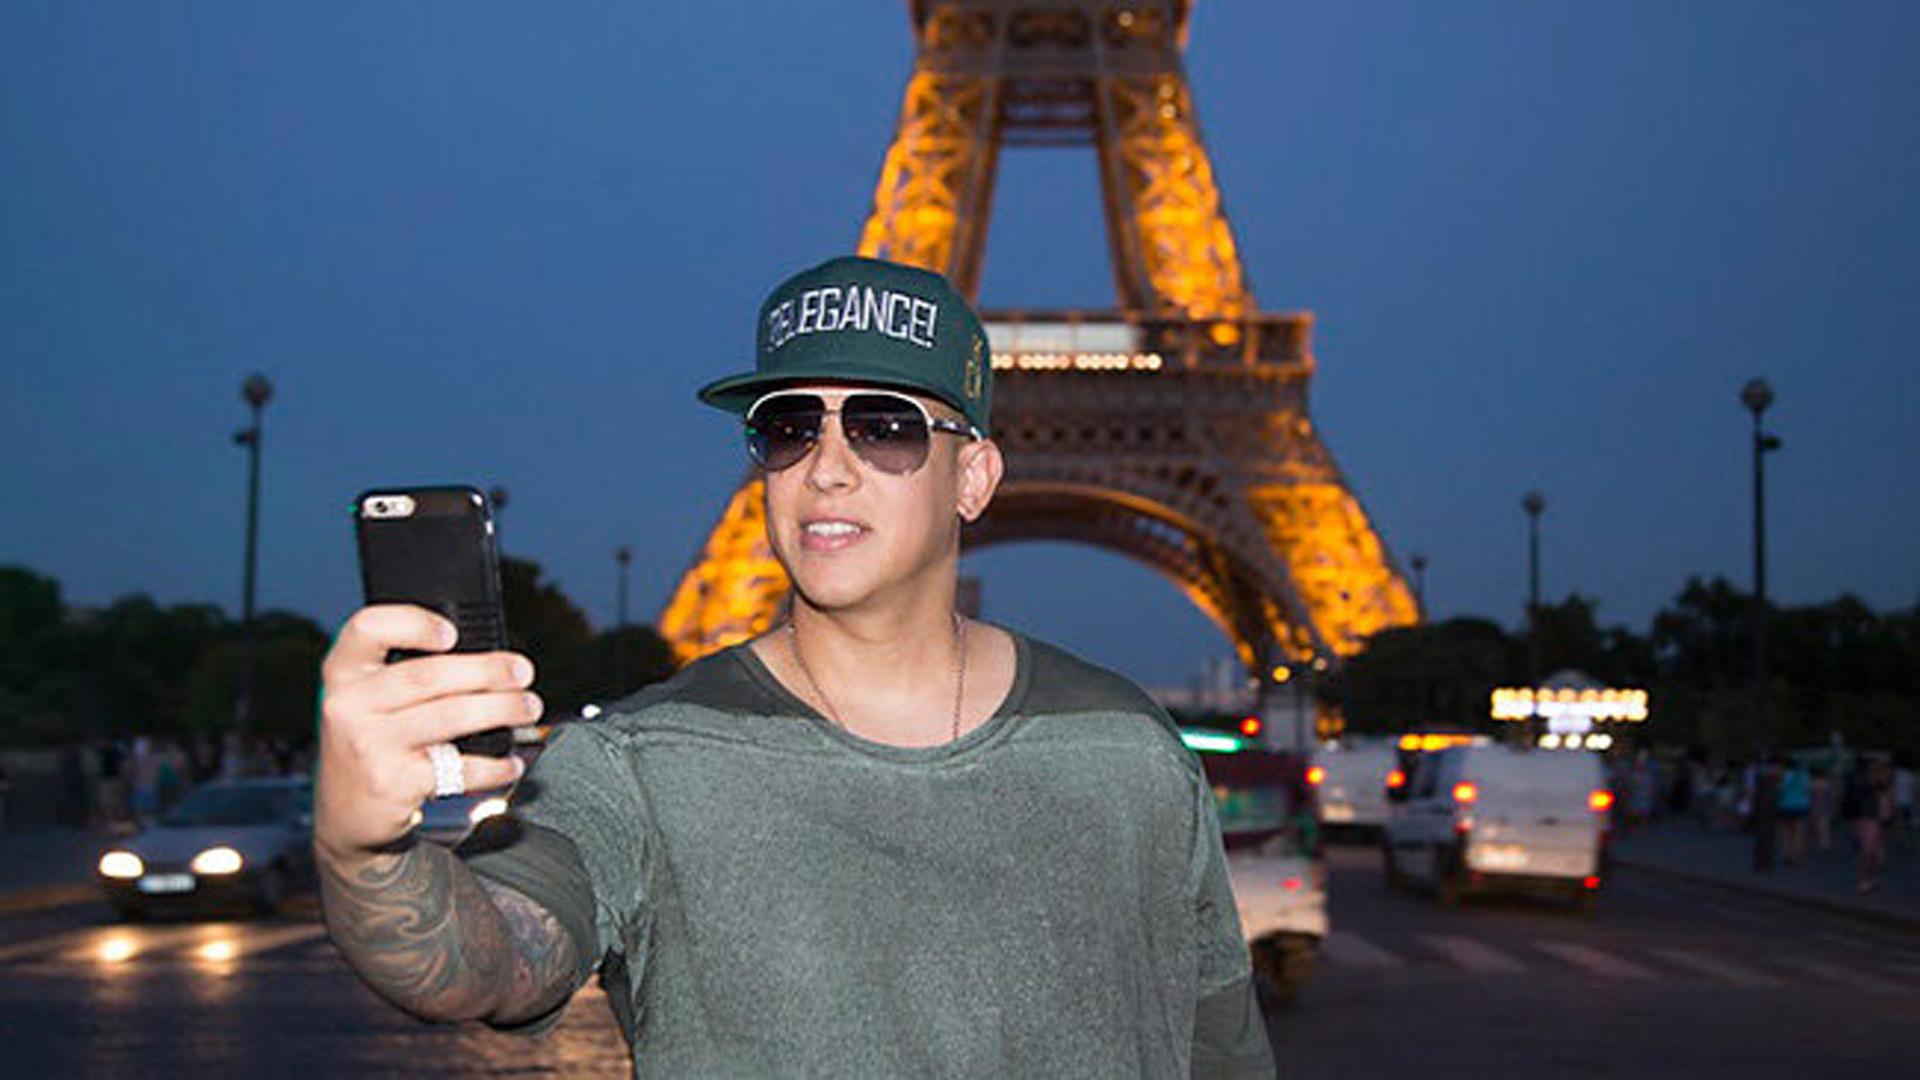 Imágenes de la gira King Daddy 2015 de Daddy Yankee en Europa